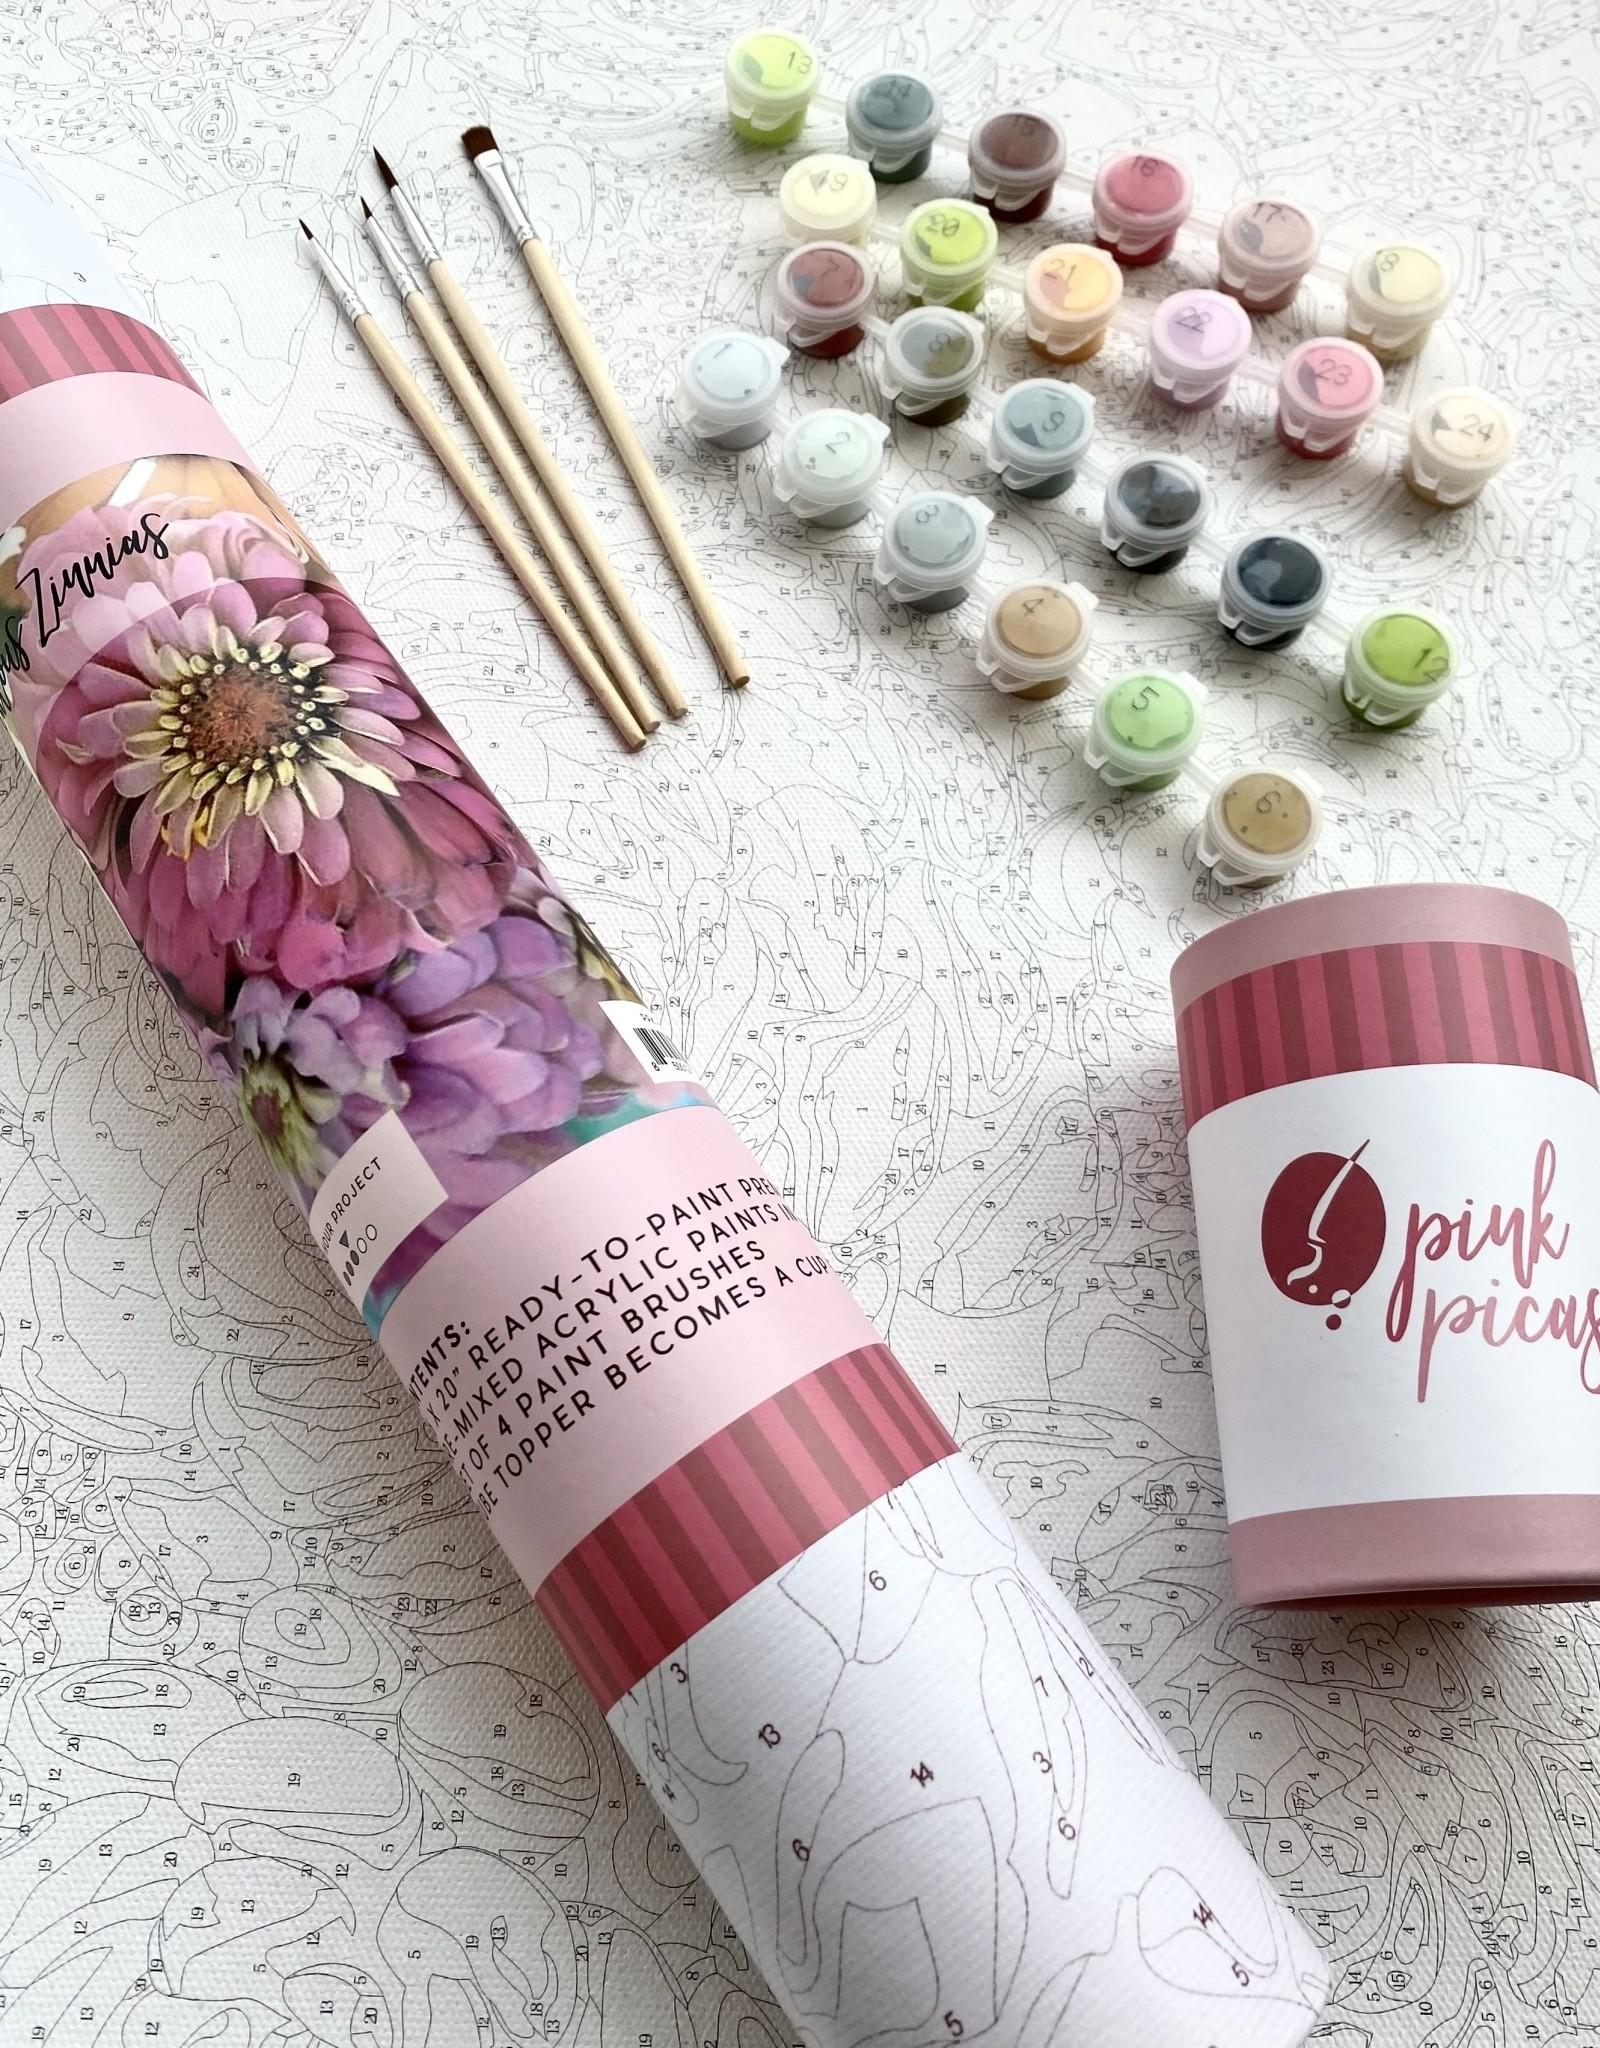 Pink Picasso Zealous Zinnias Paint Kit